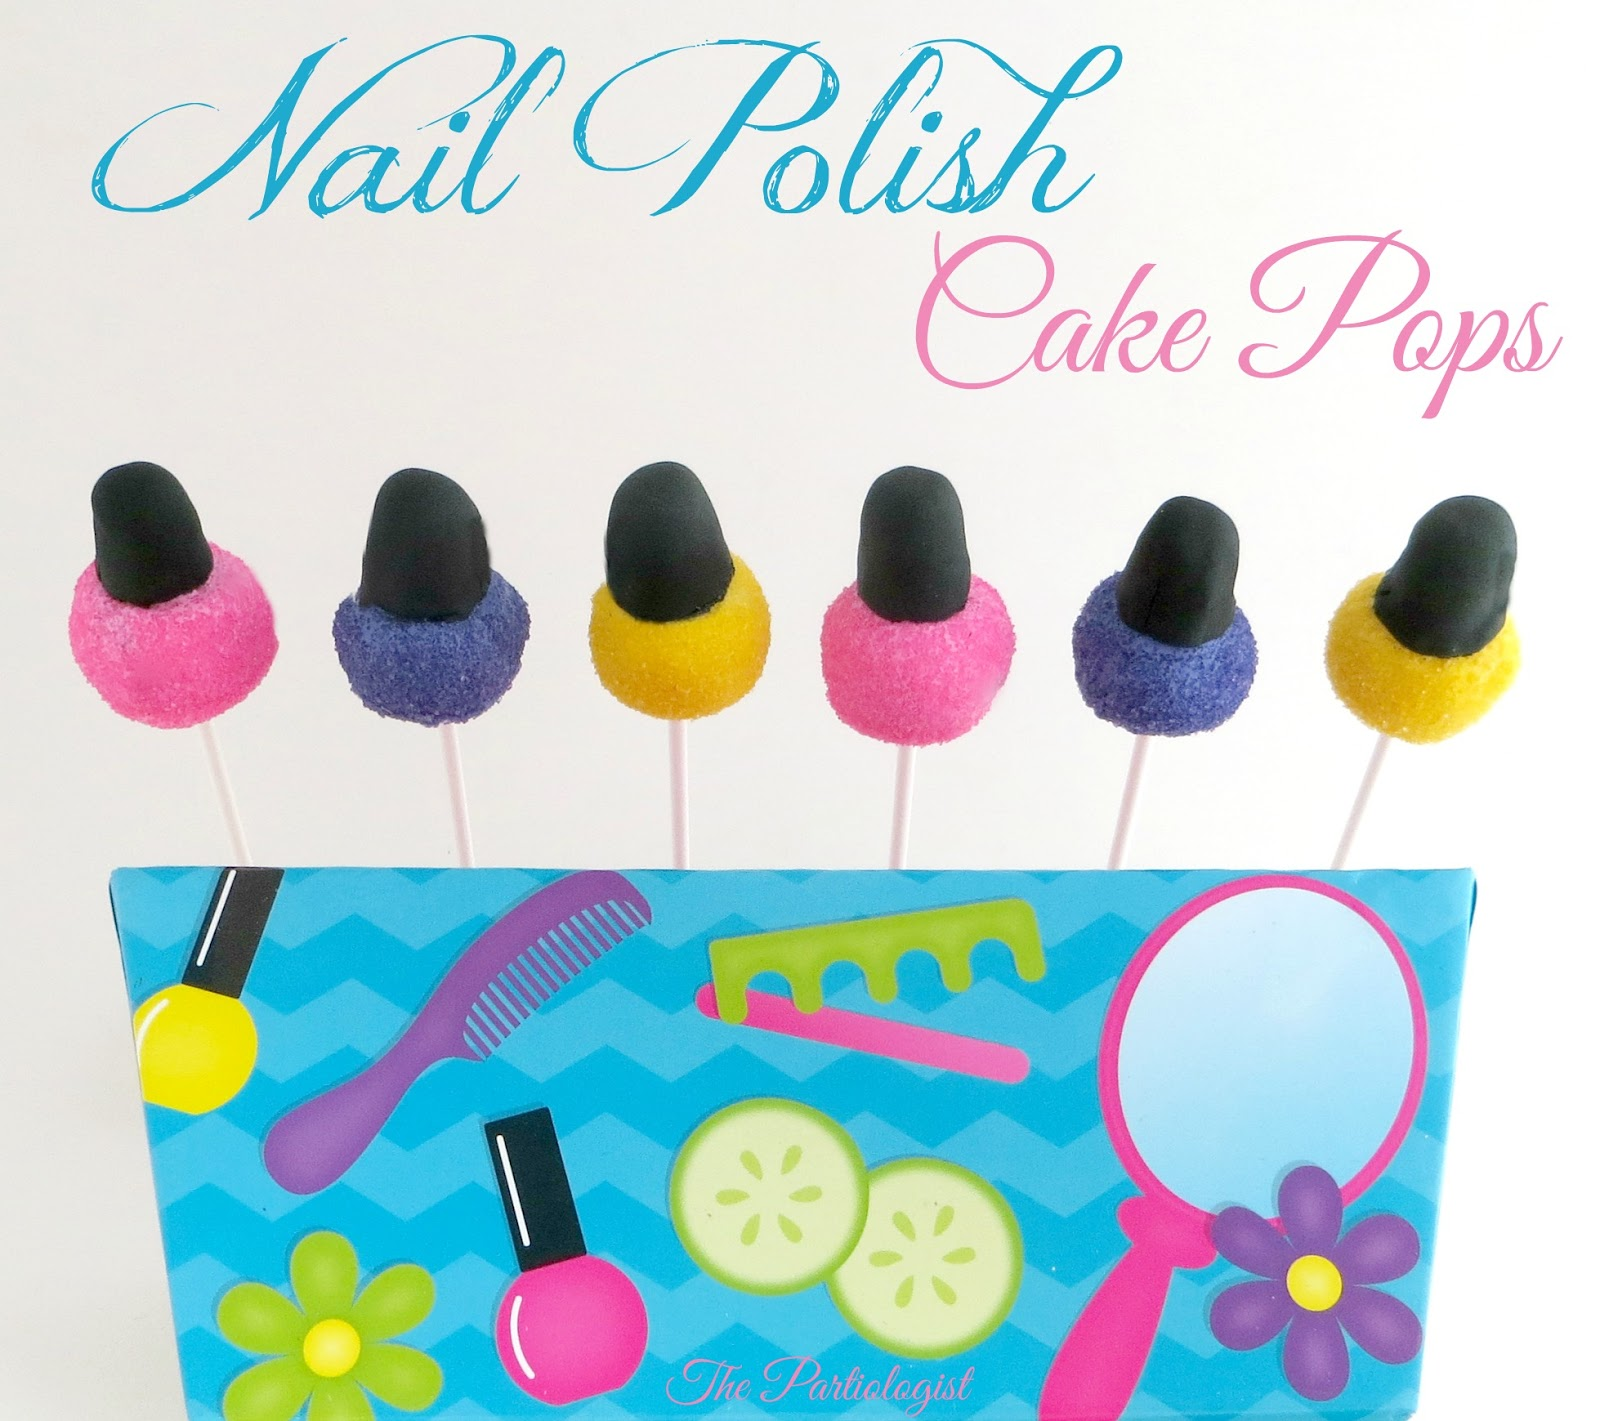 Cake Nail Polish Designs: The Partiologist: Nail Polish Cake Pops